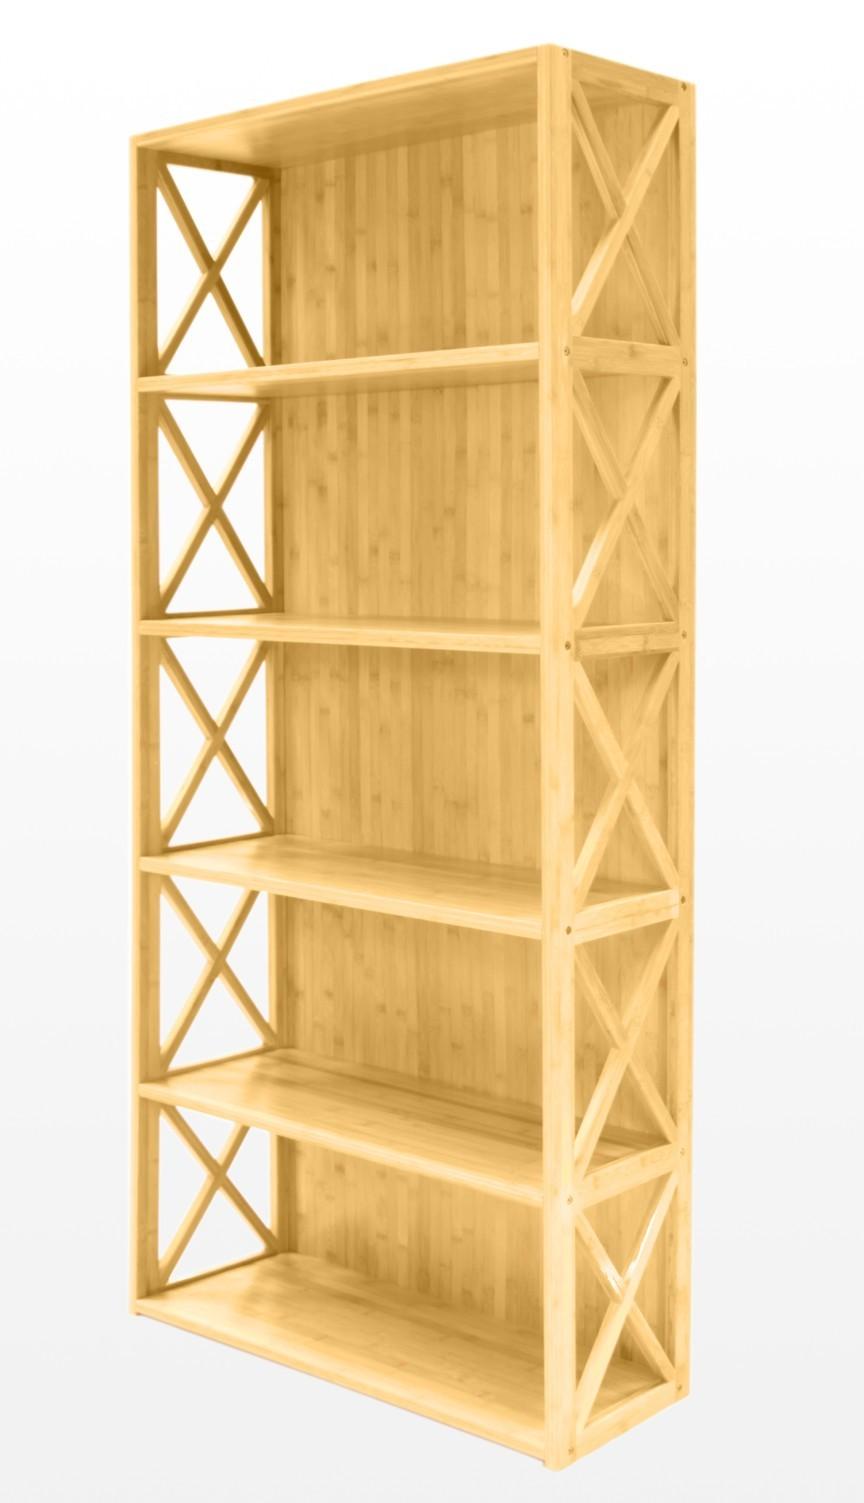 Bookcase, 5 Book Shelves | Bamboo Furniture